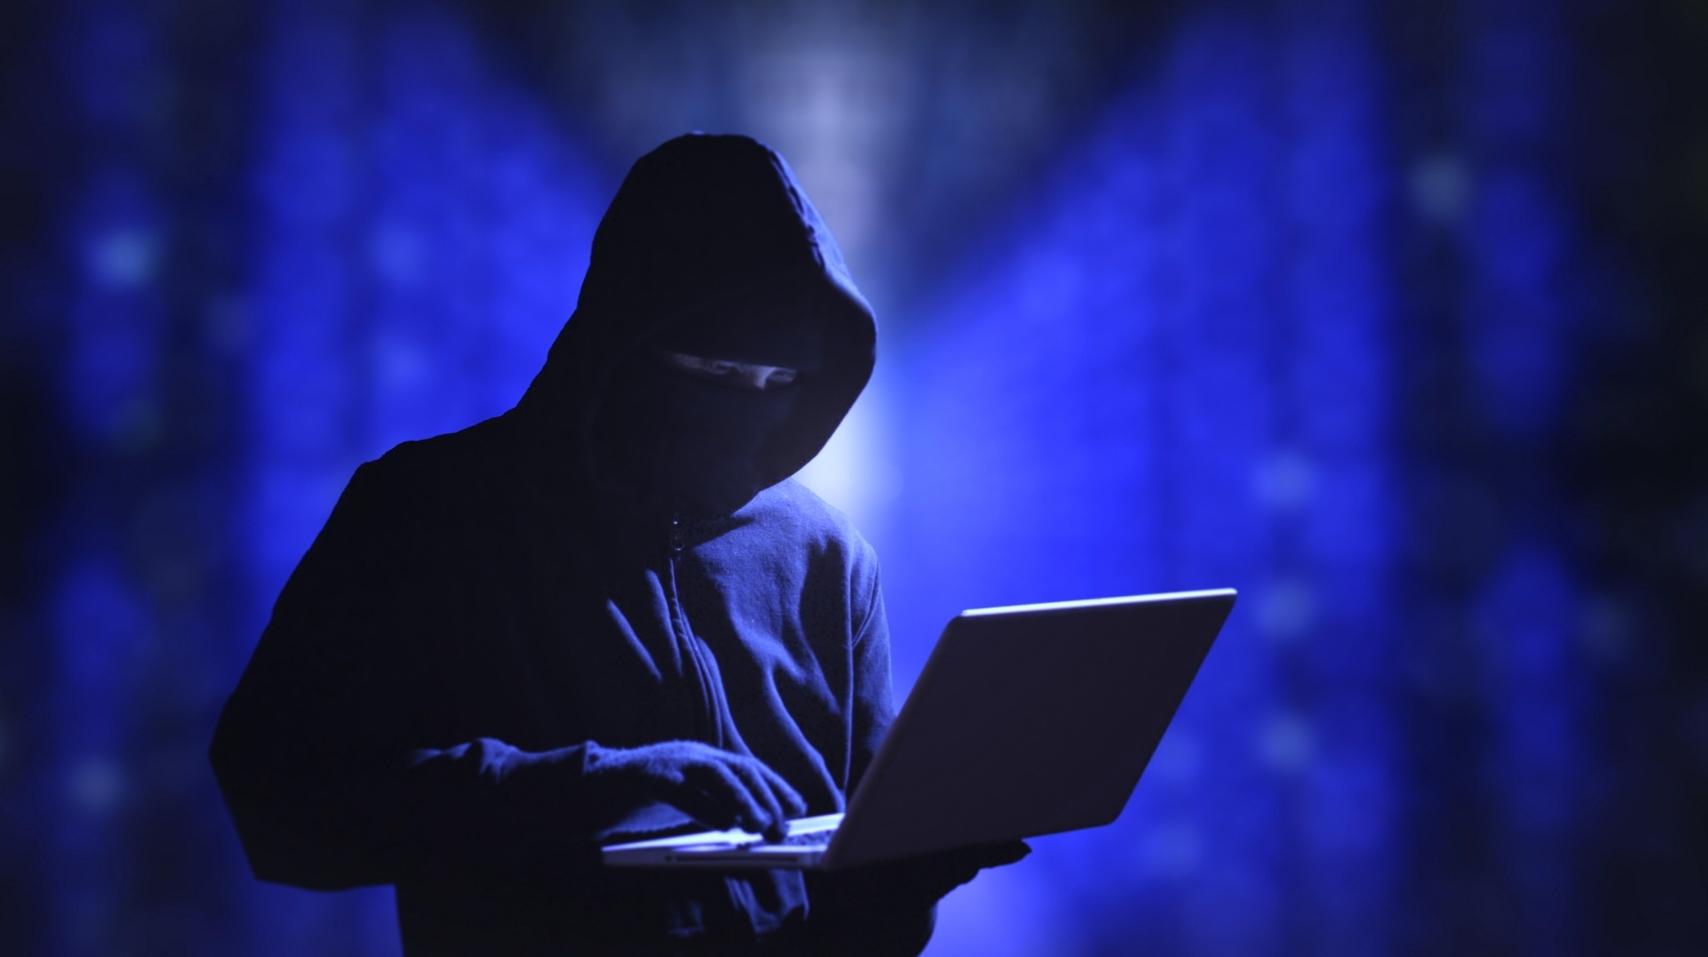 MS Exchange Servers hacked